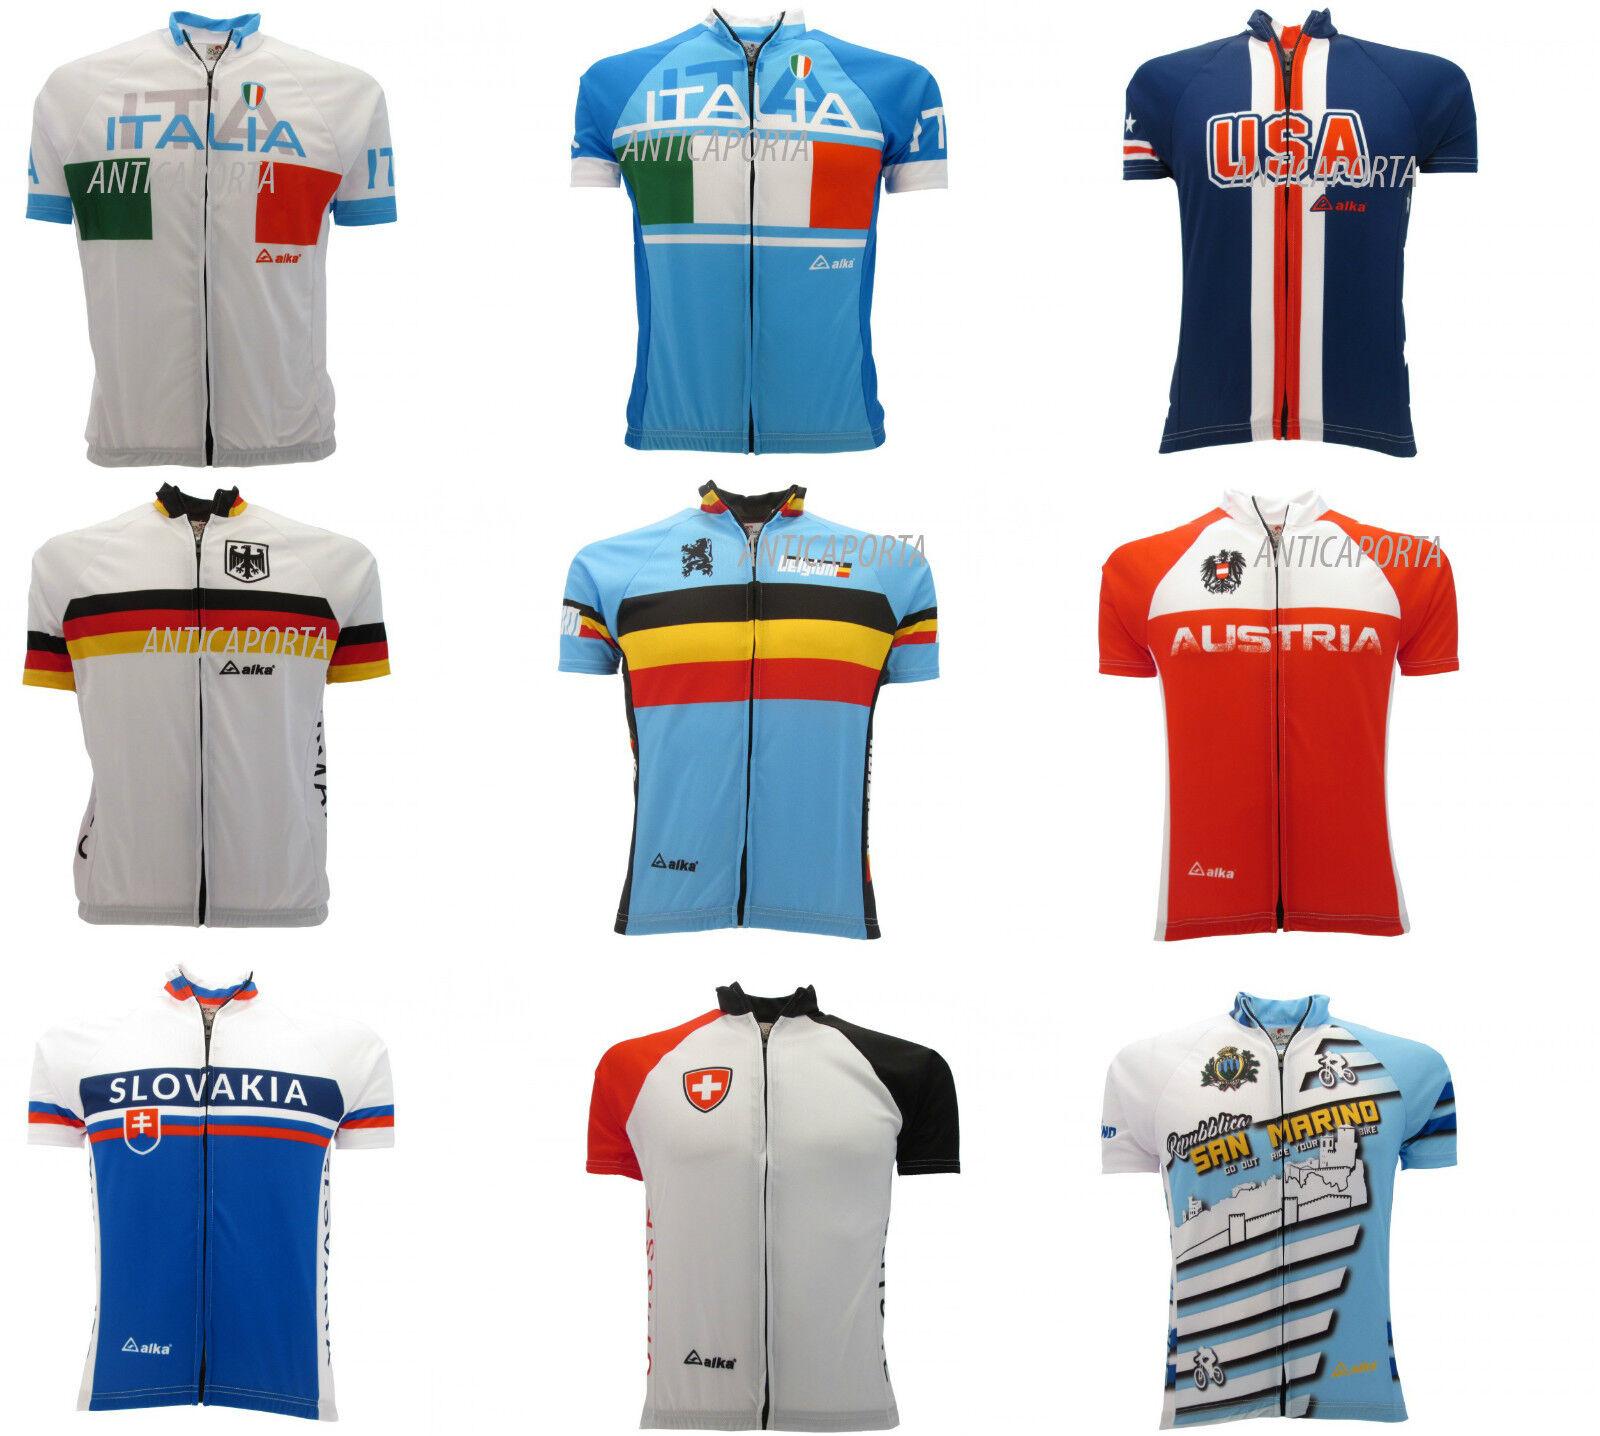 Shirt Skyline Project Cycling National  Germany Austria USA Technical